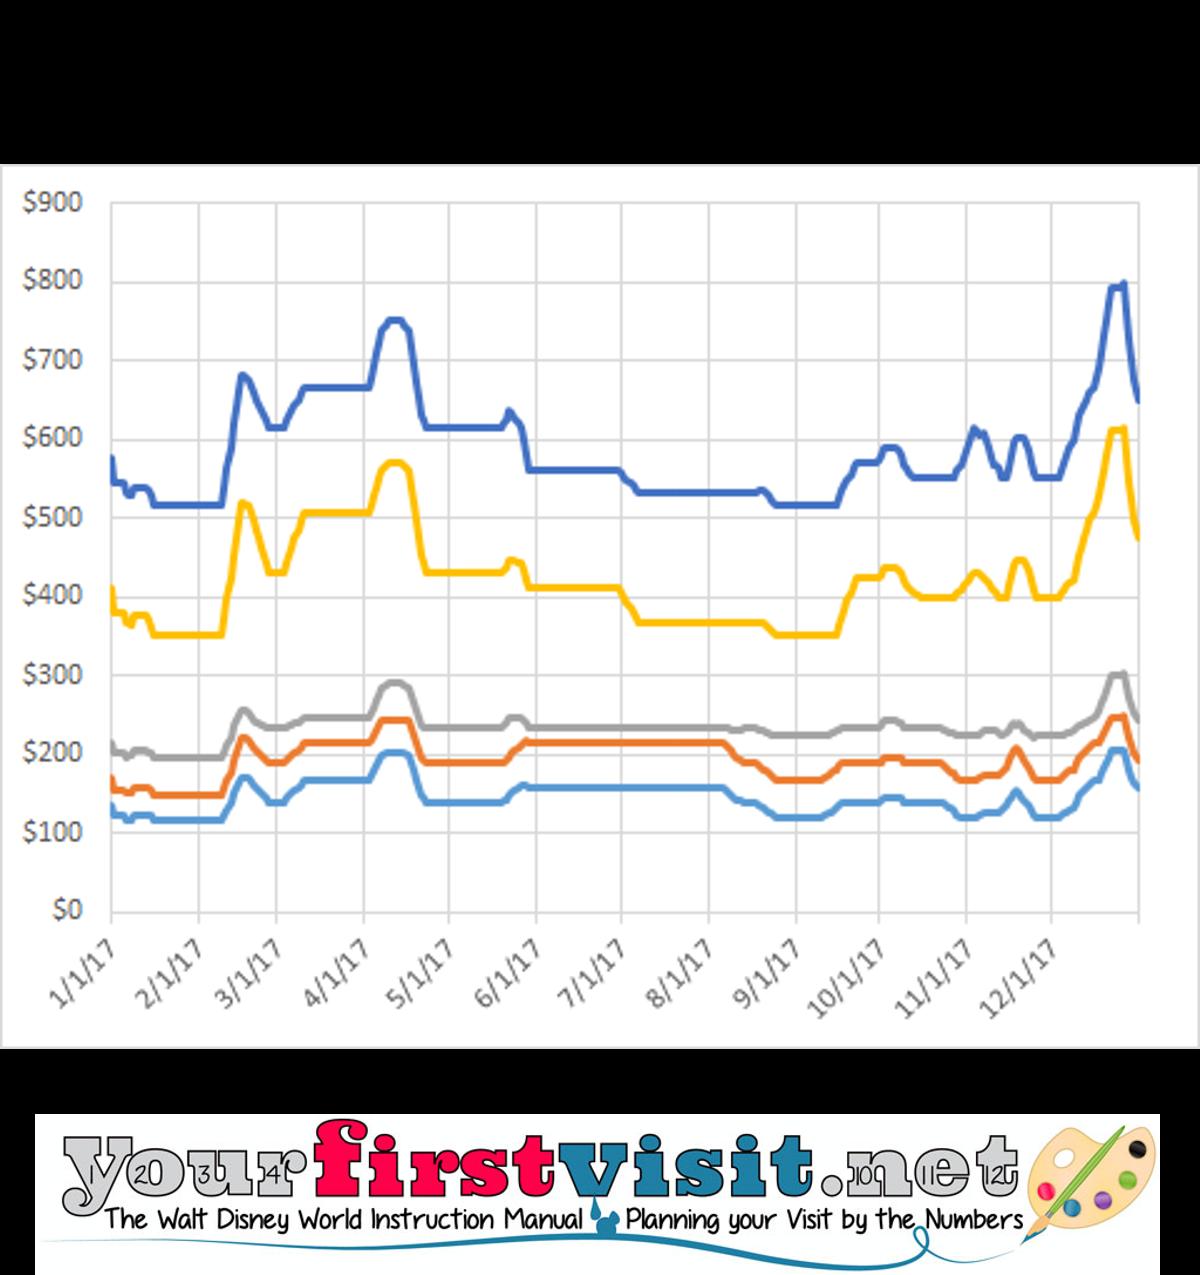 disney-world-2017-price-seasons-from-yourfirstvisit-net